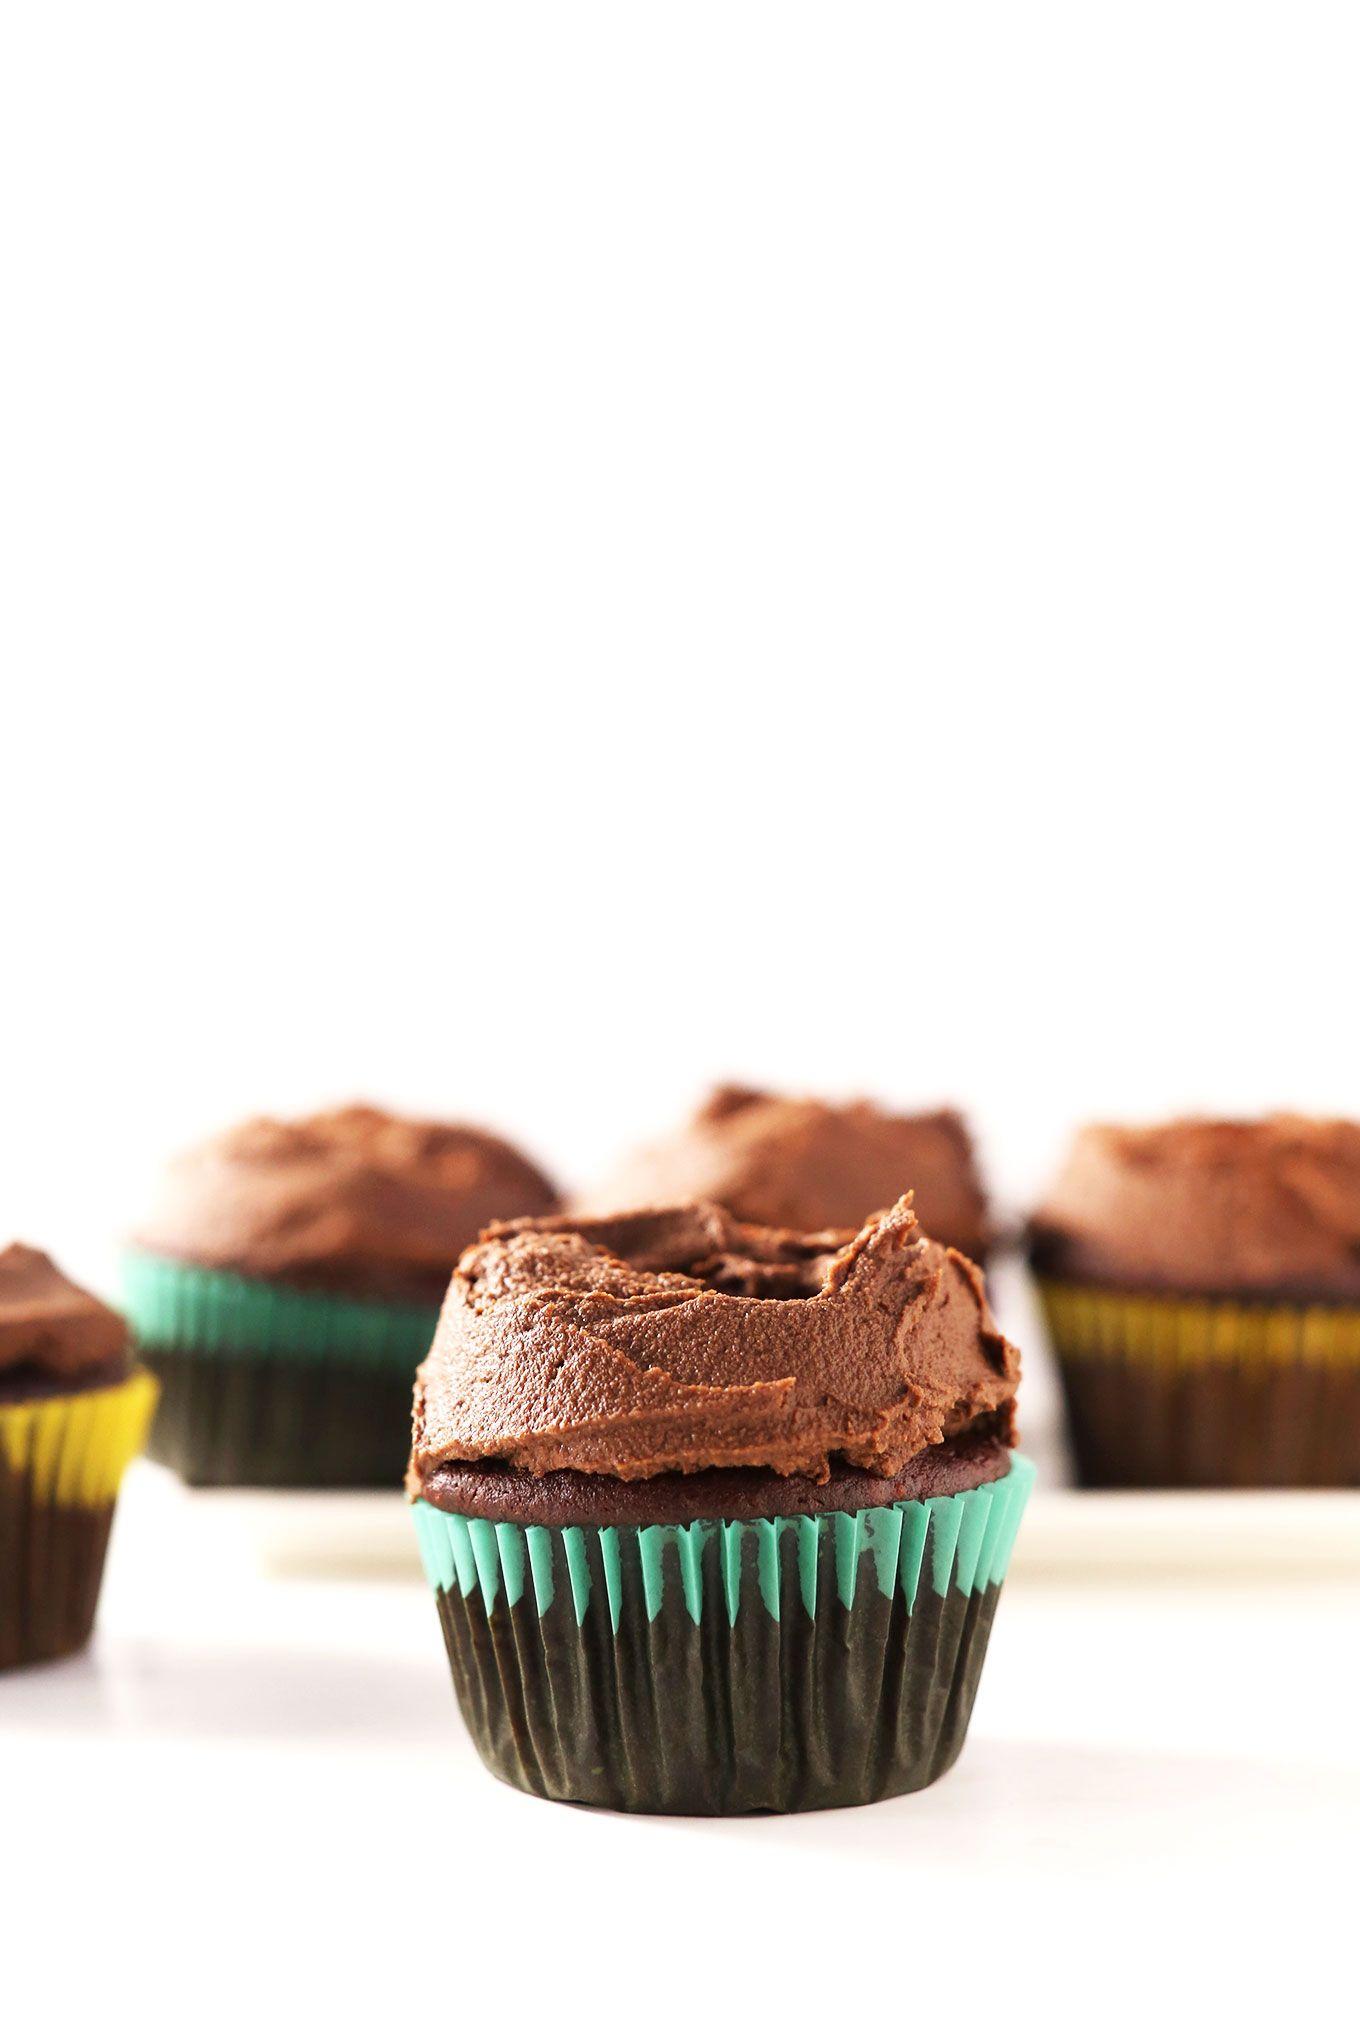 THE BEST Vegan Gluten Free Chocolate Cupcakes! Fudgy, moist and just 1 bowl required! #vegan #glutenfree #chocolate